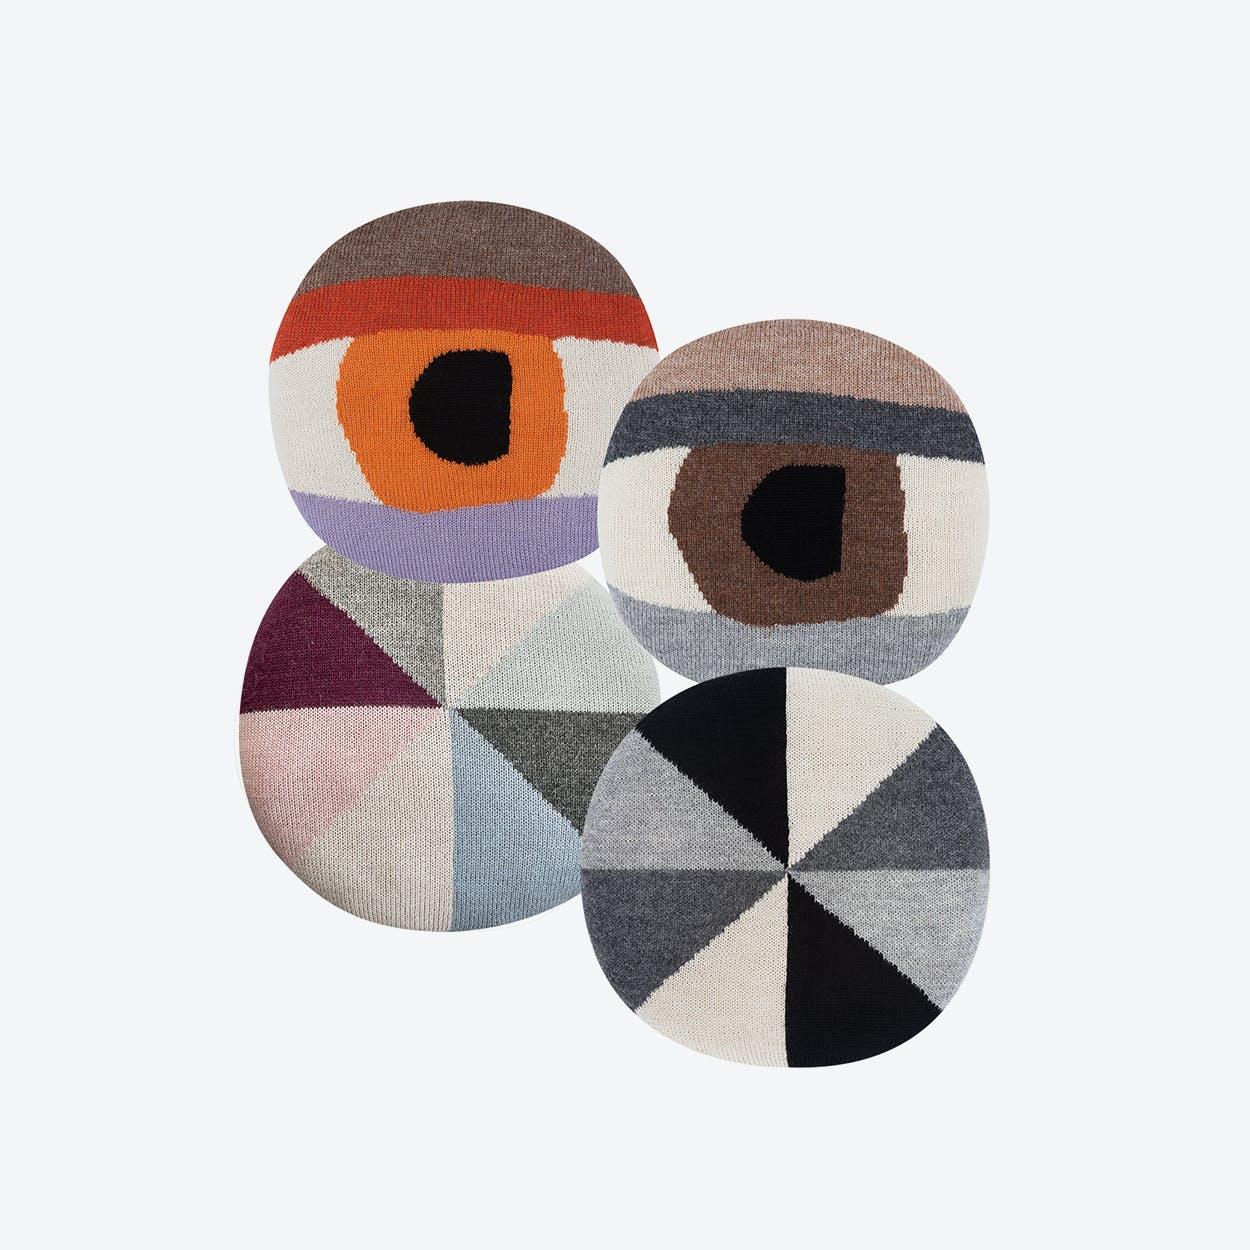 Bobby in Grey, Flower & Pretty Eye Chair Pillow in Brown & Orange